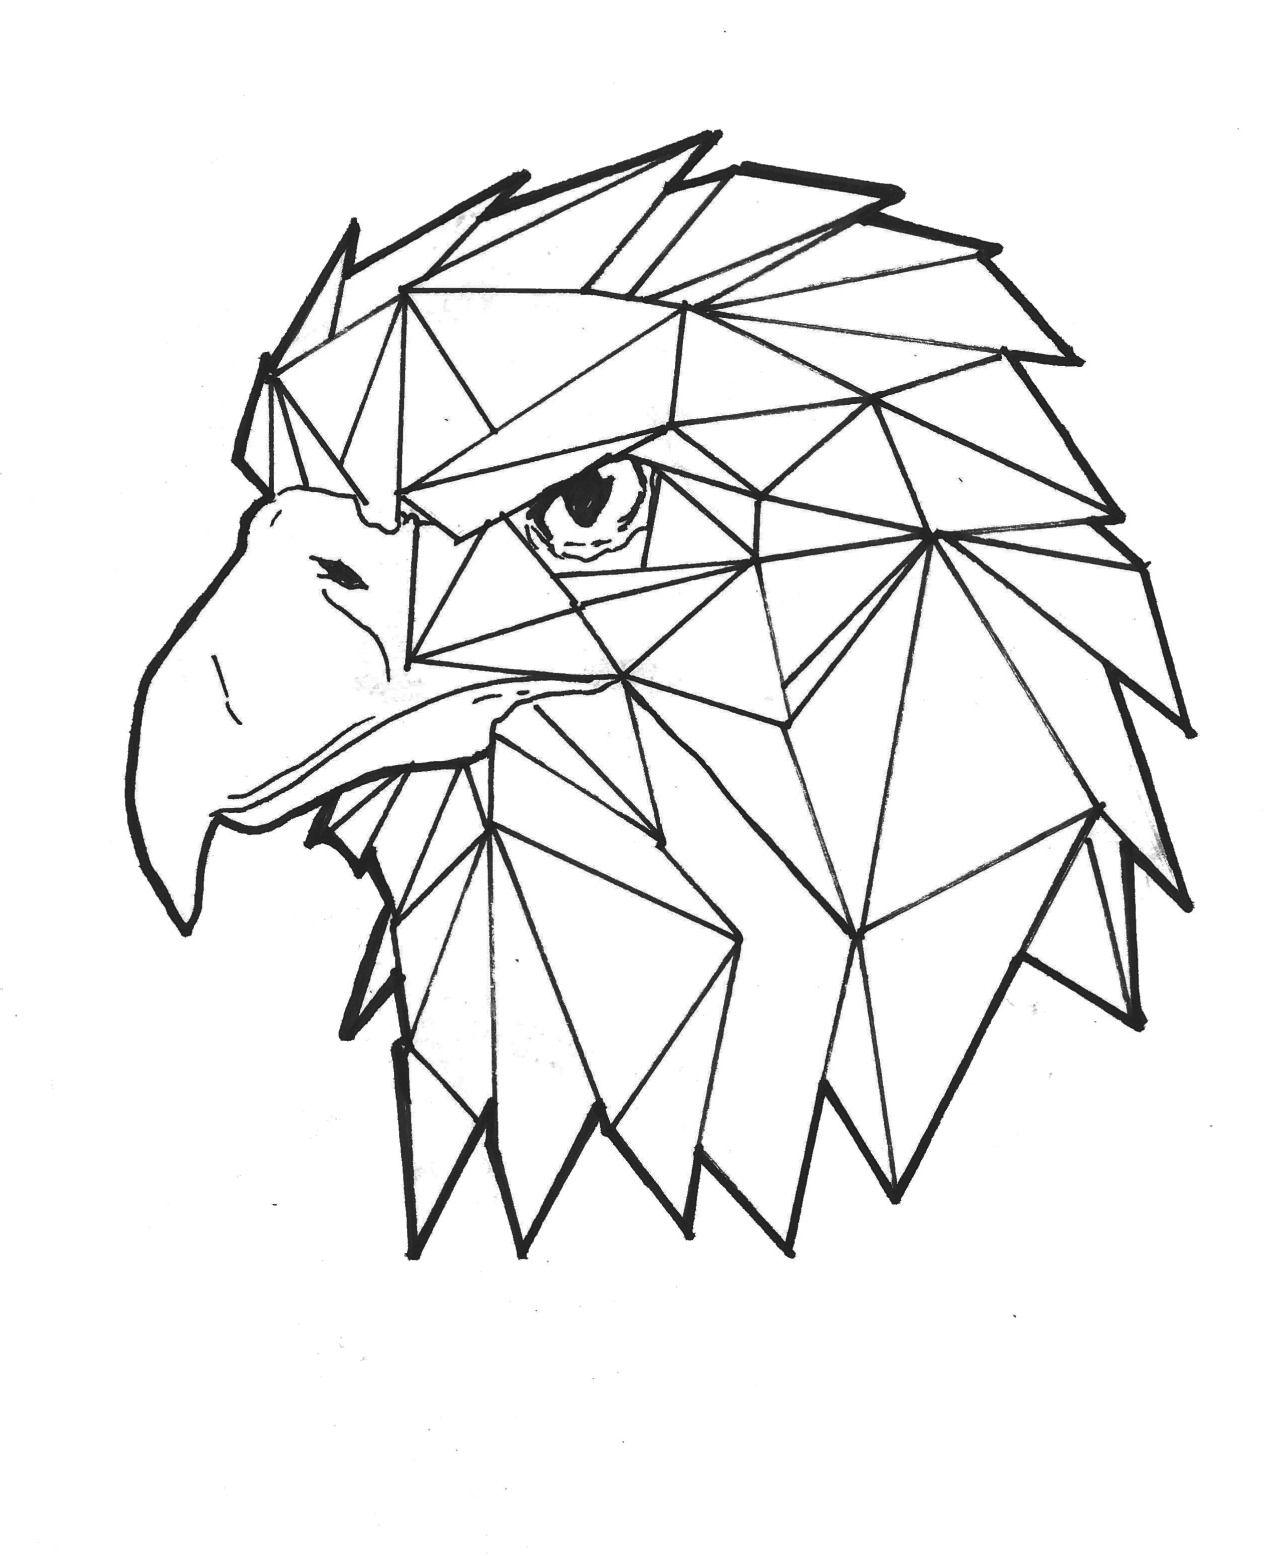 Animales Geometrizados Buscar Con Google Tatto Dibujo